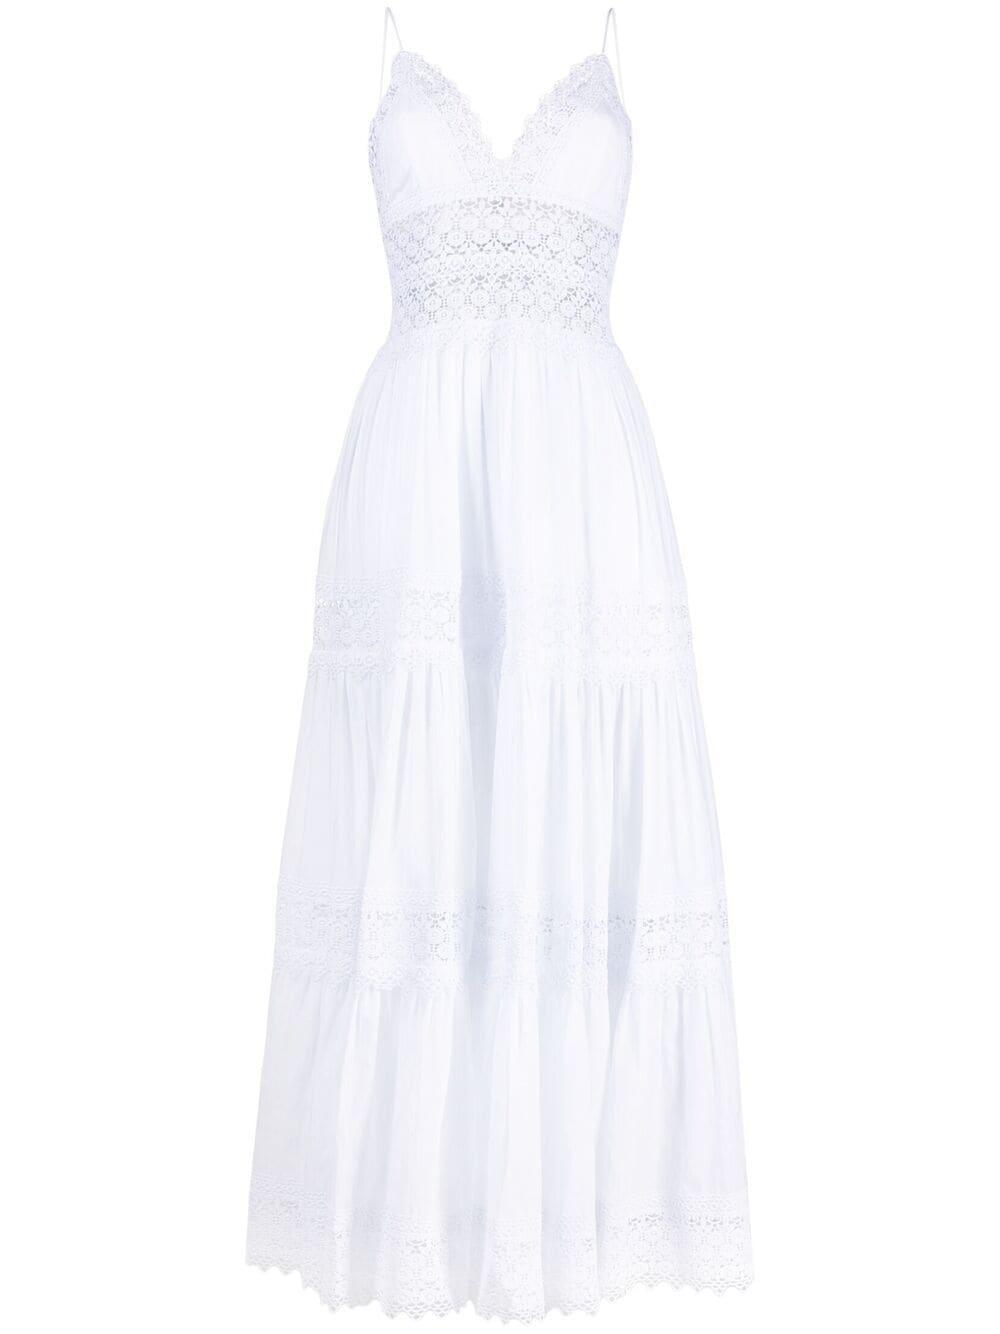 Cindy Maxi Dress Item # 201638